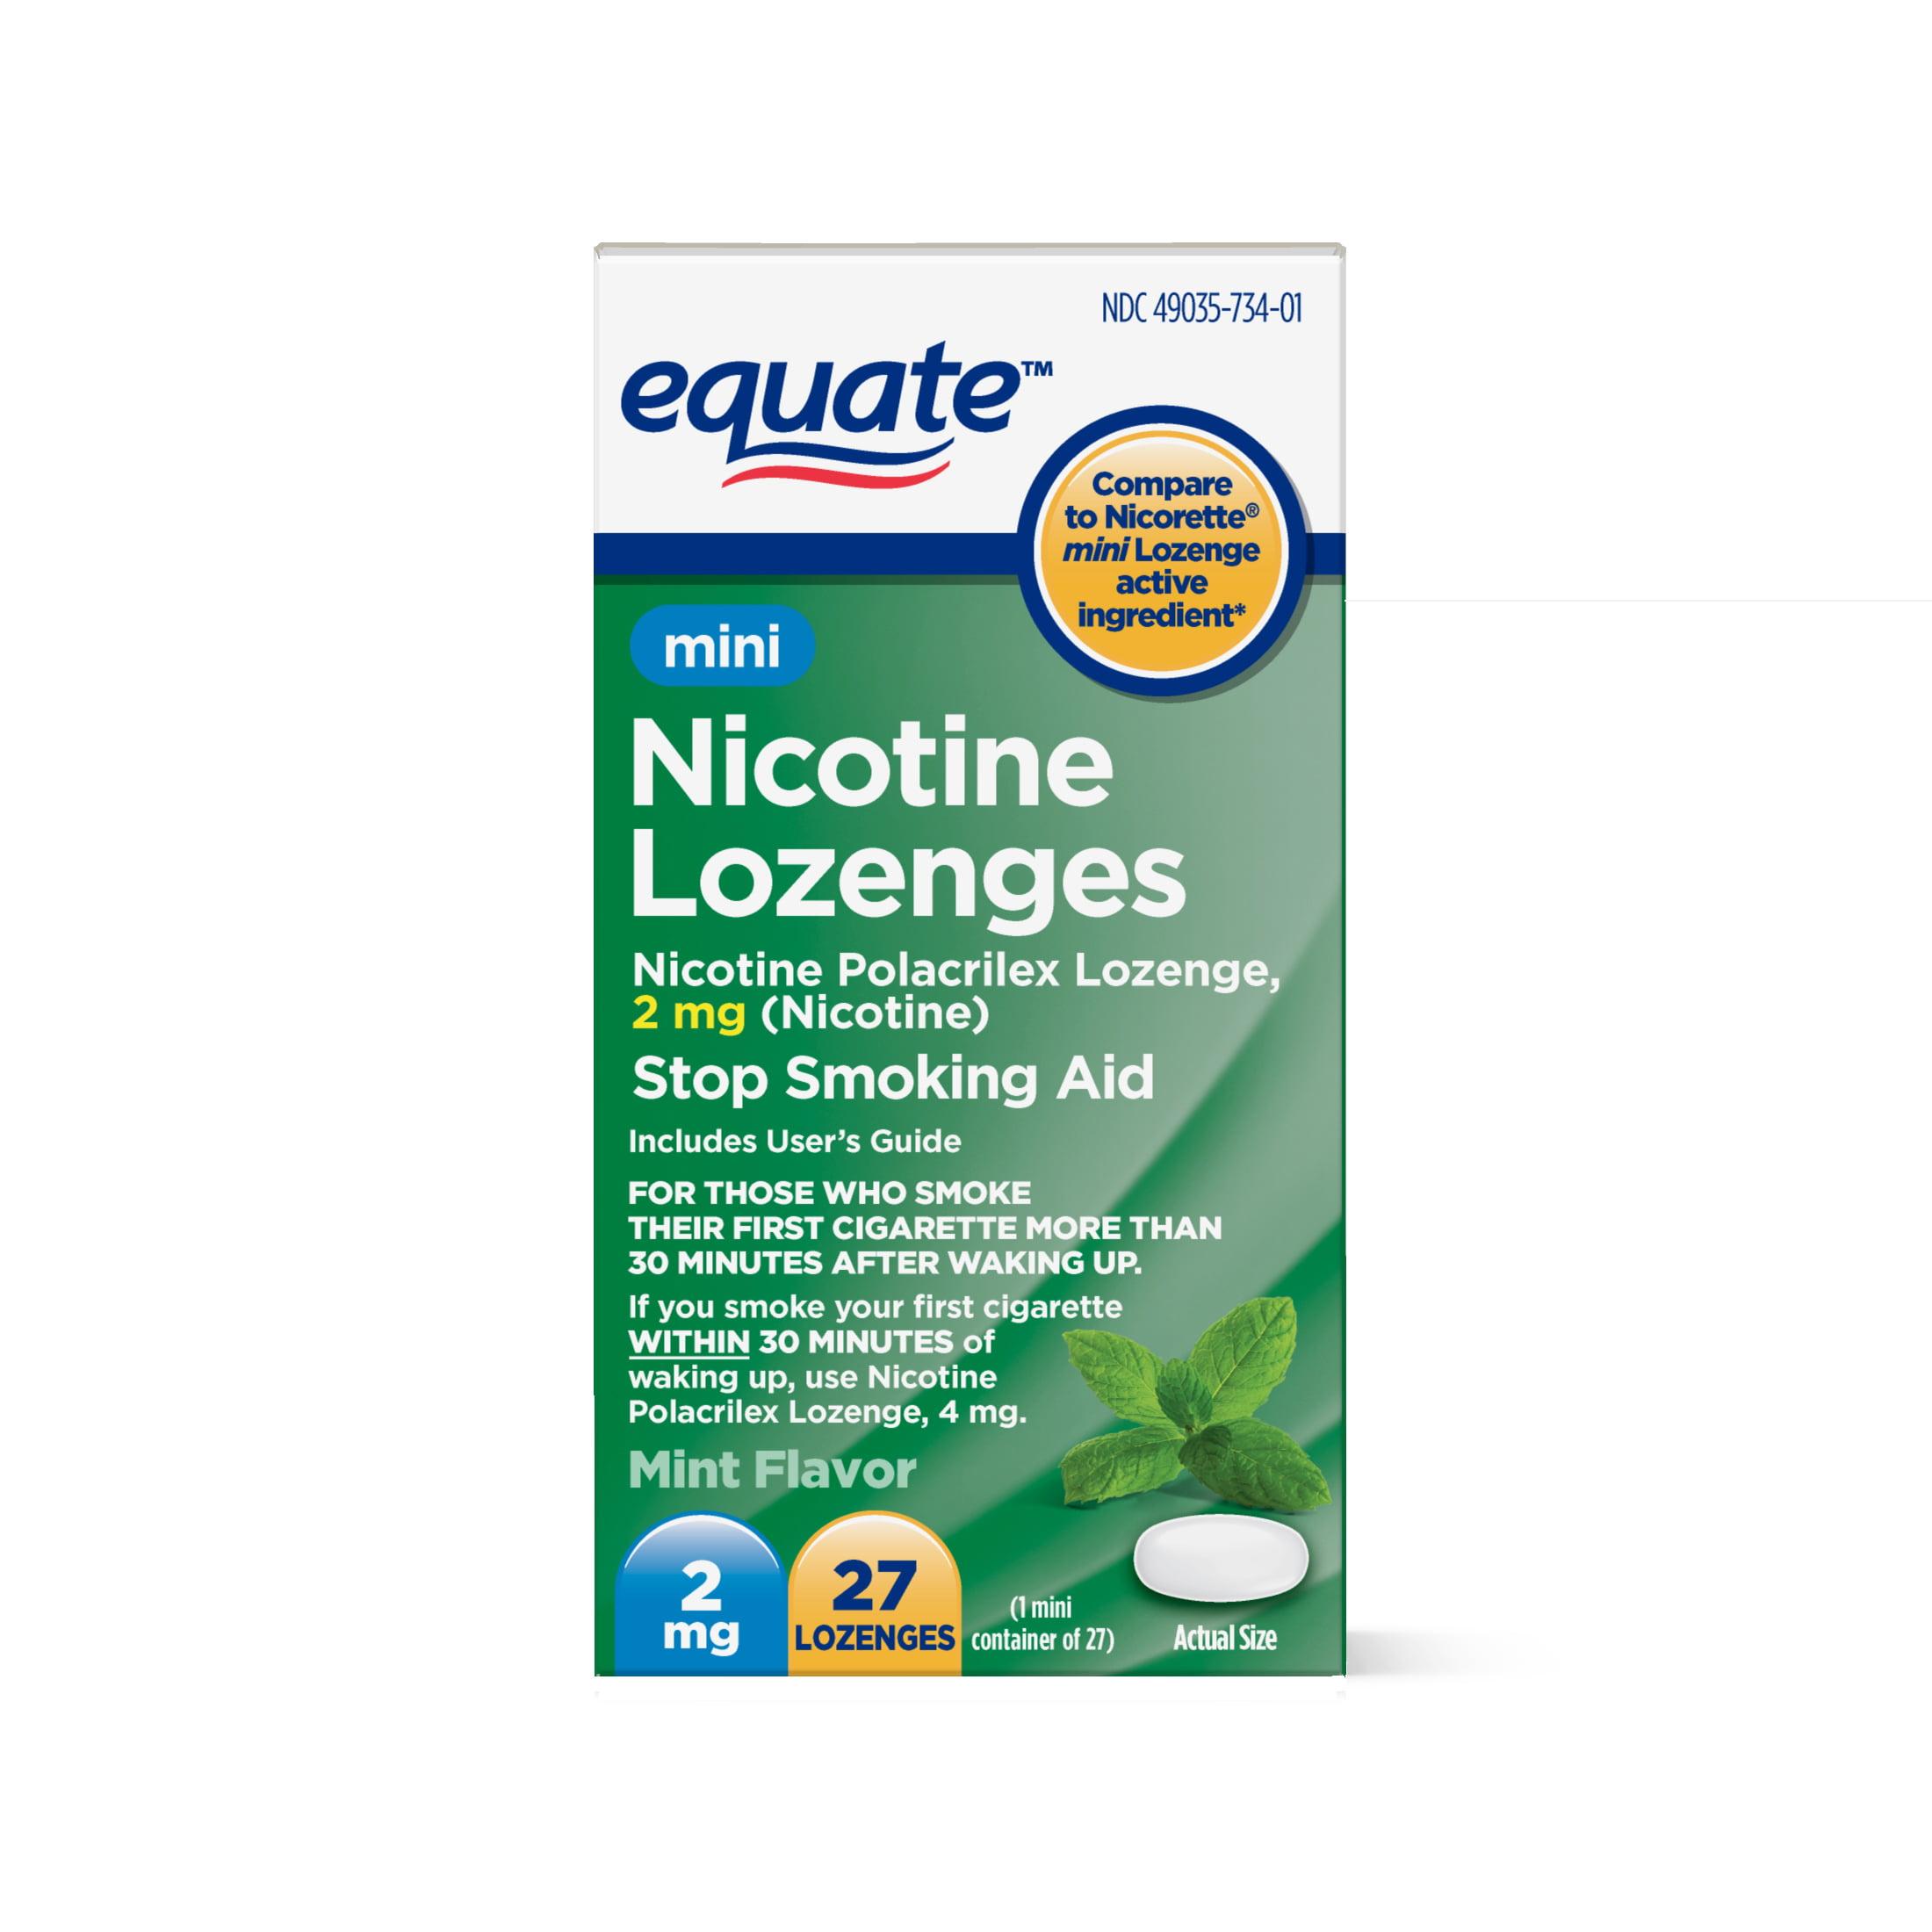 Equate Mini Nicotine Lozenges, Mint Flavor, 2 mg, 27 Ct